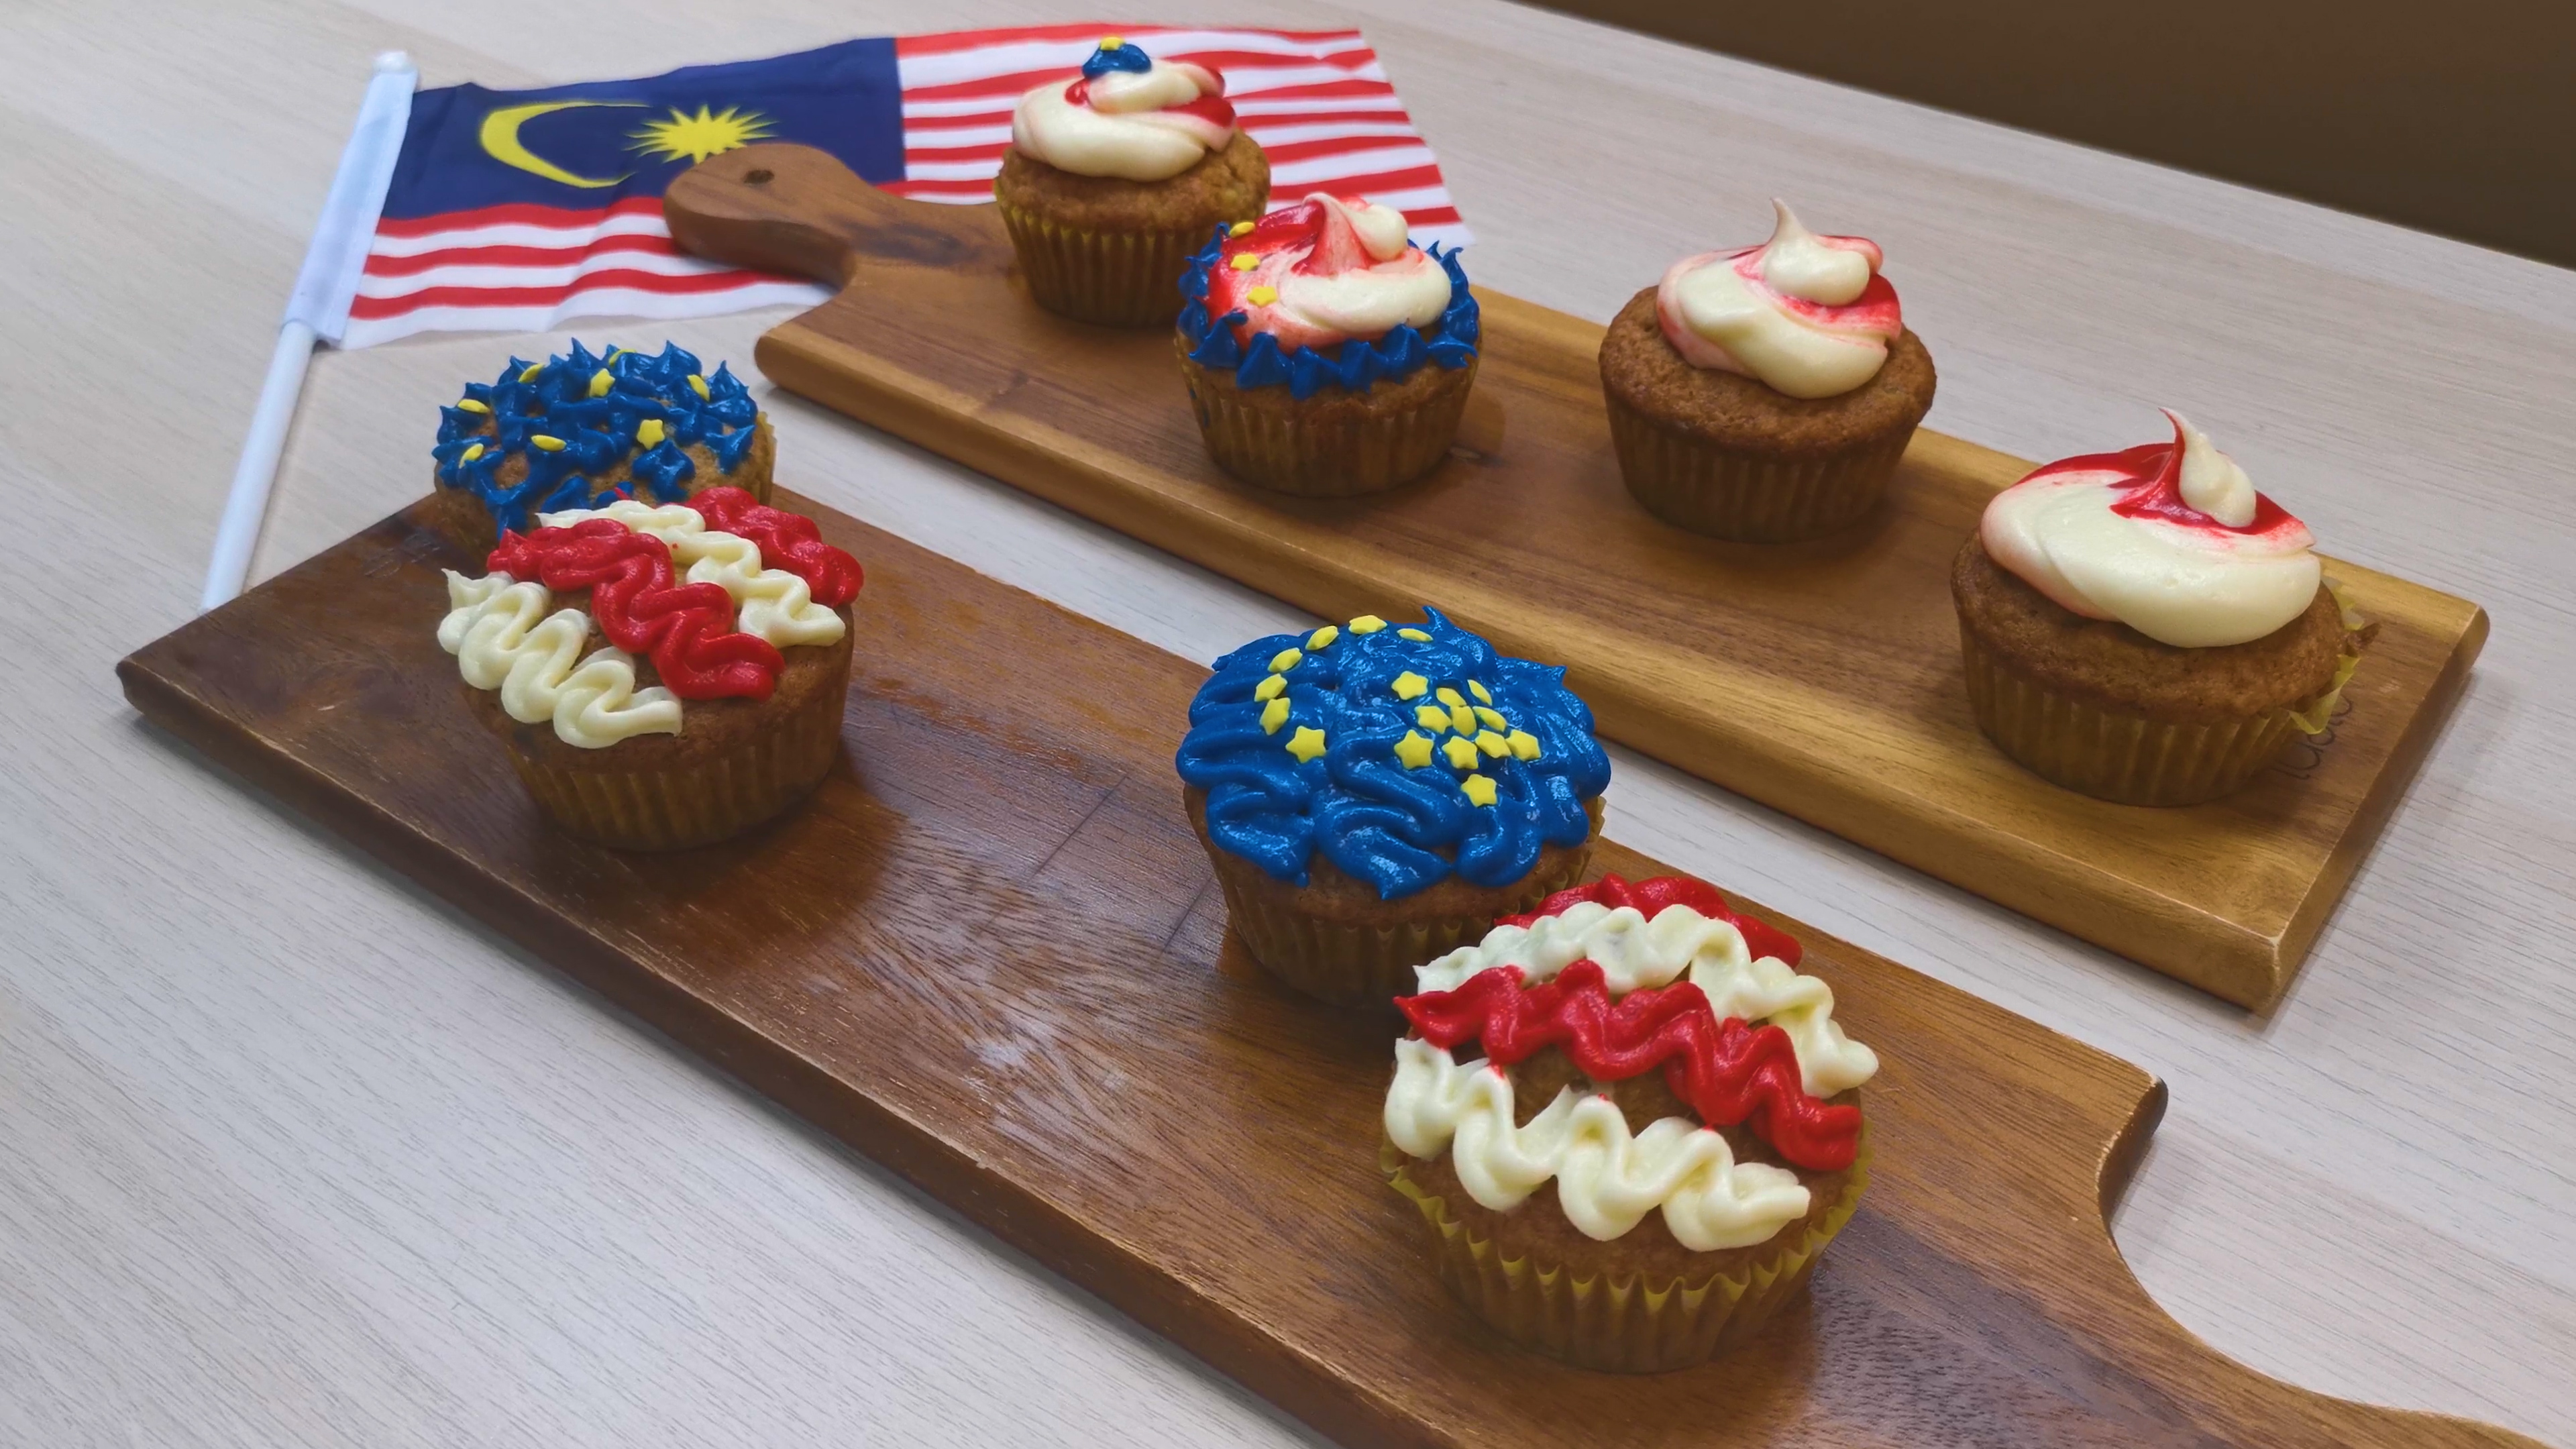 Hari Merdeka Cupcakes